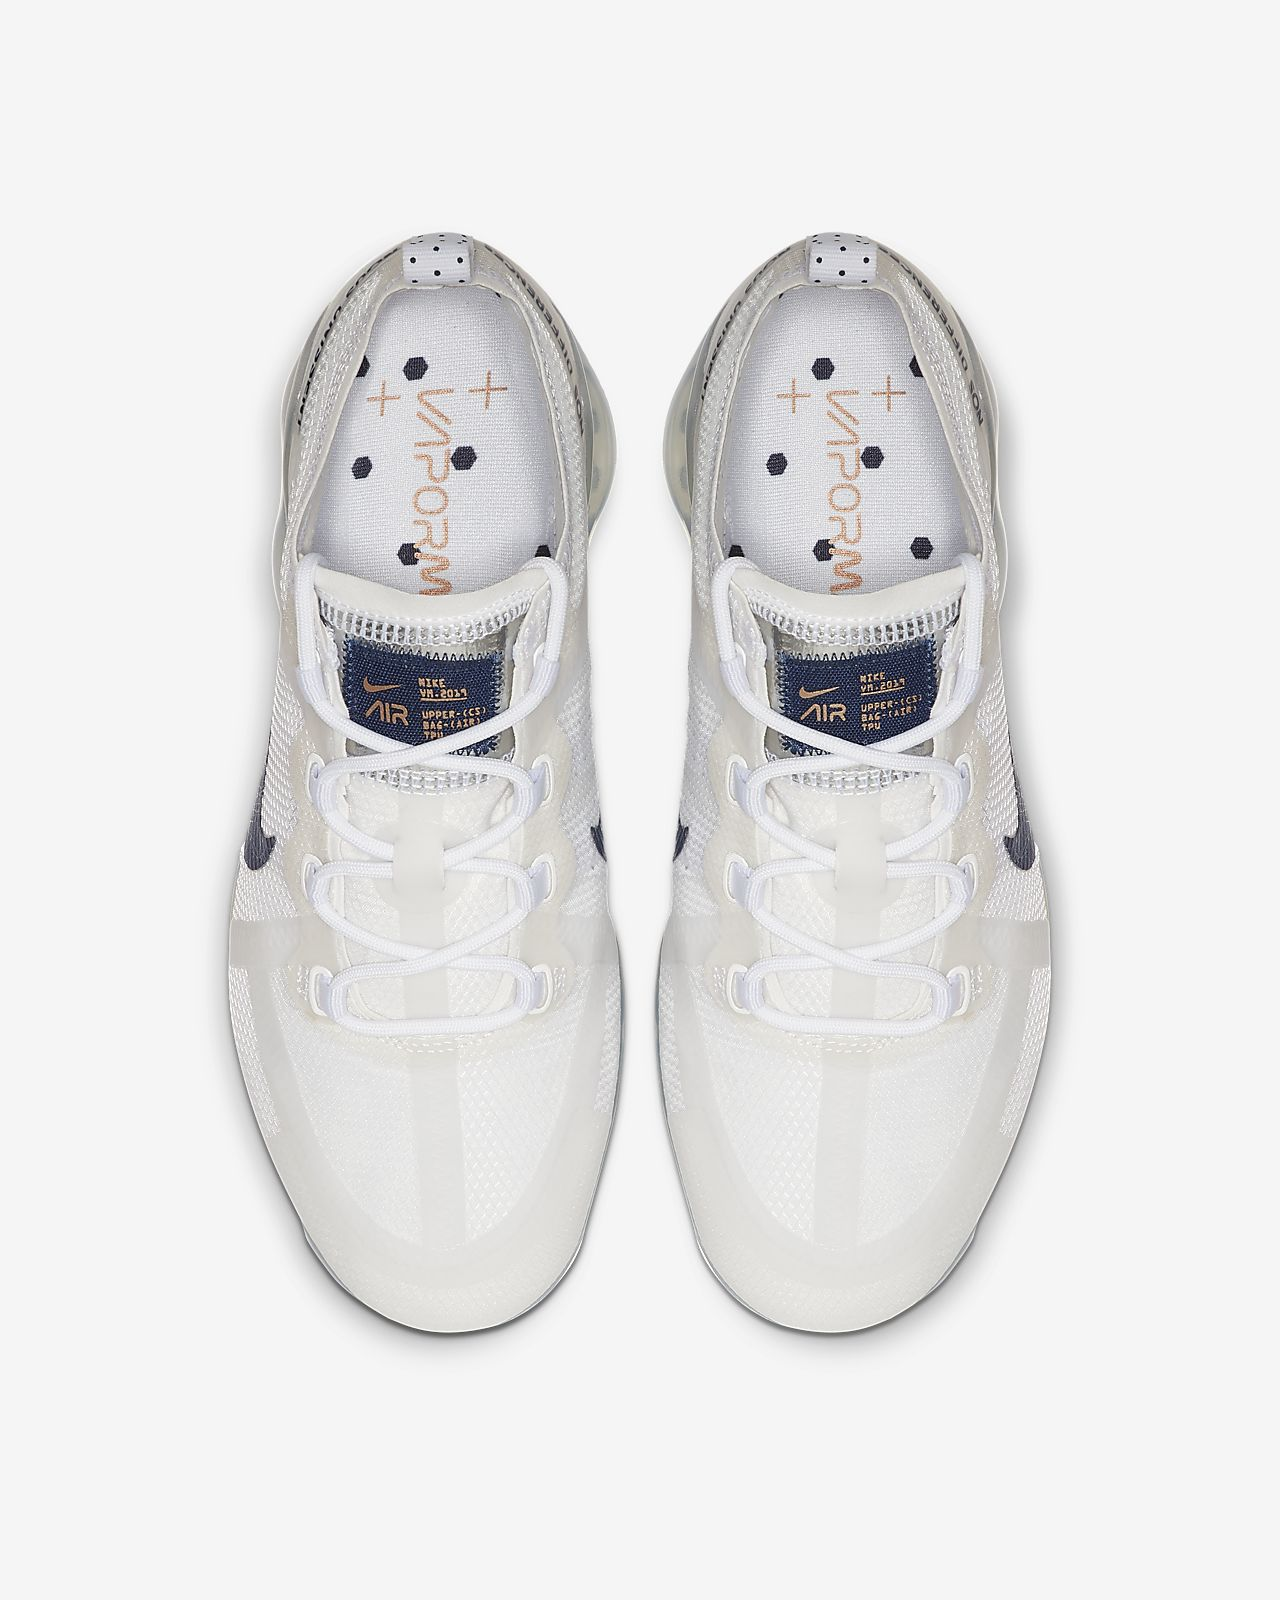 dbc67af487 Nike Air VaporMax 2019 Unité Totale Women's Shoe. Nike.com ZA